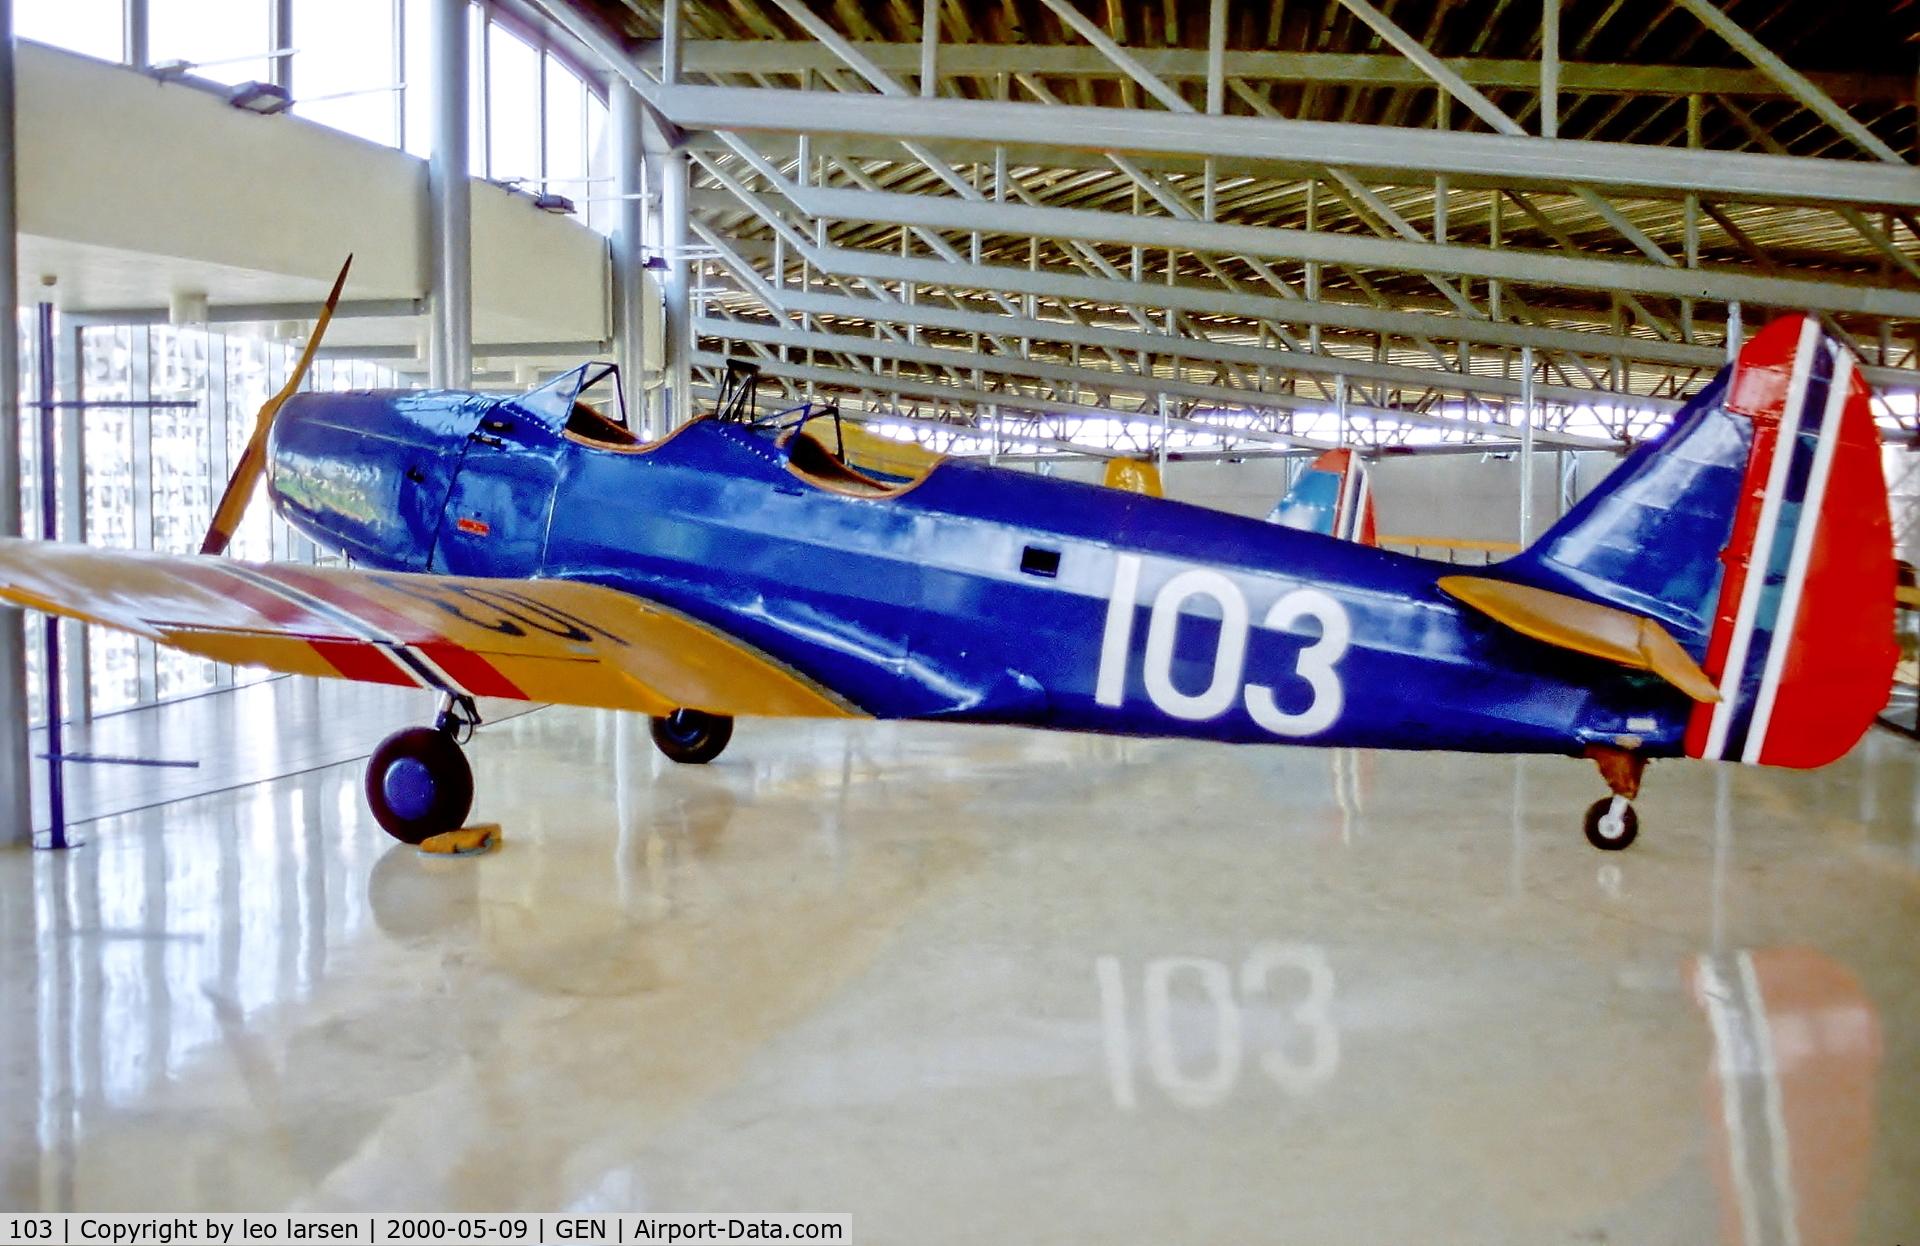 103, 1940 Fairchild PT-19 C/N T40208, Forsvarsmuseet Gardermoen 9.5.00